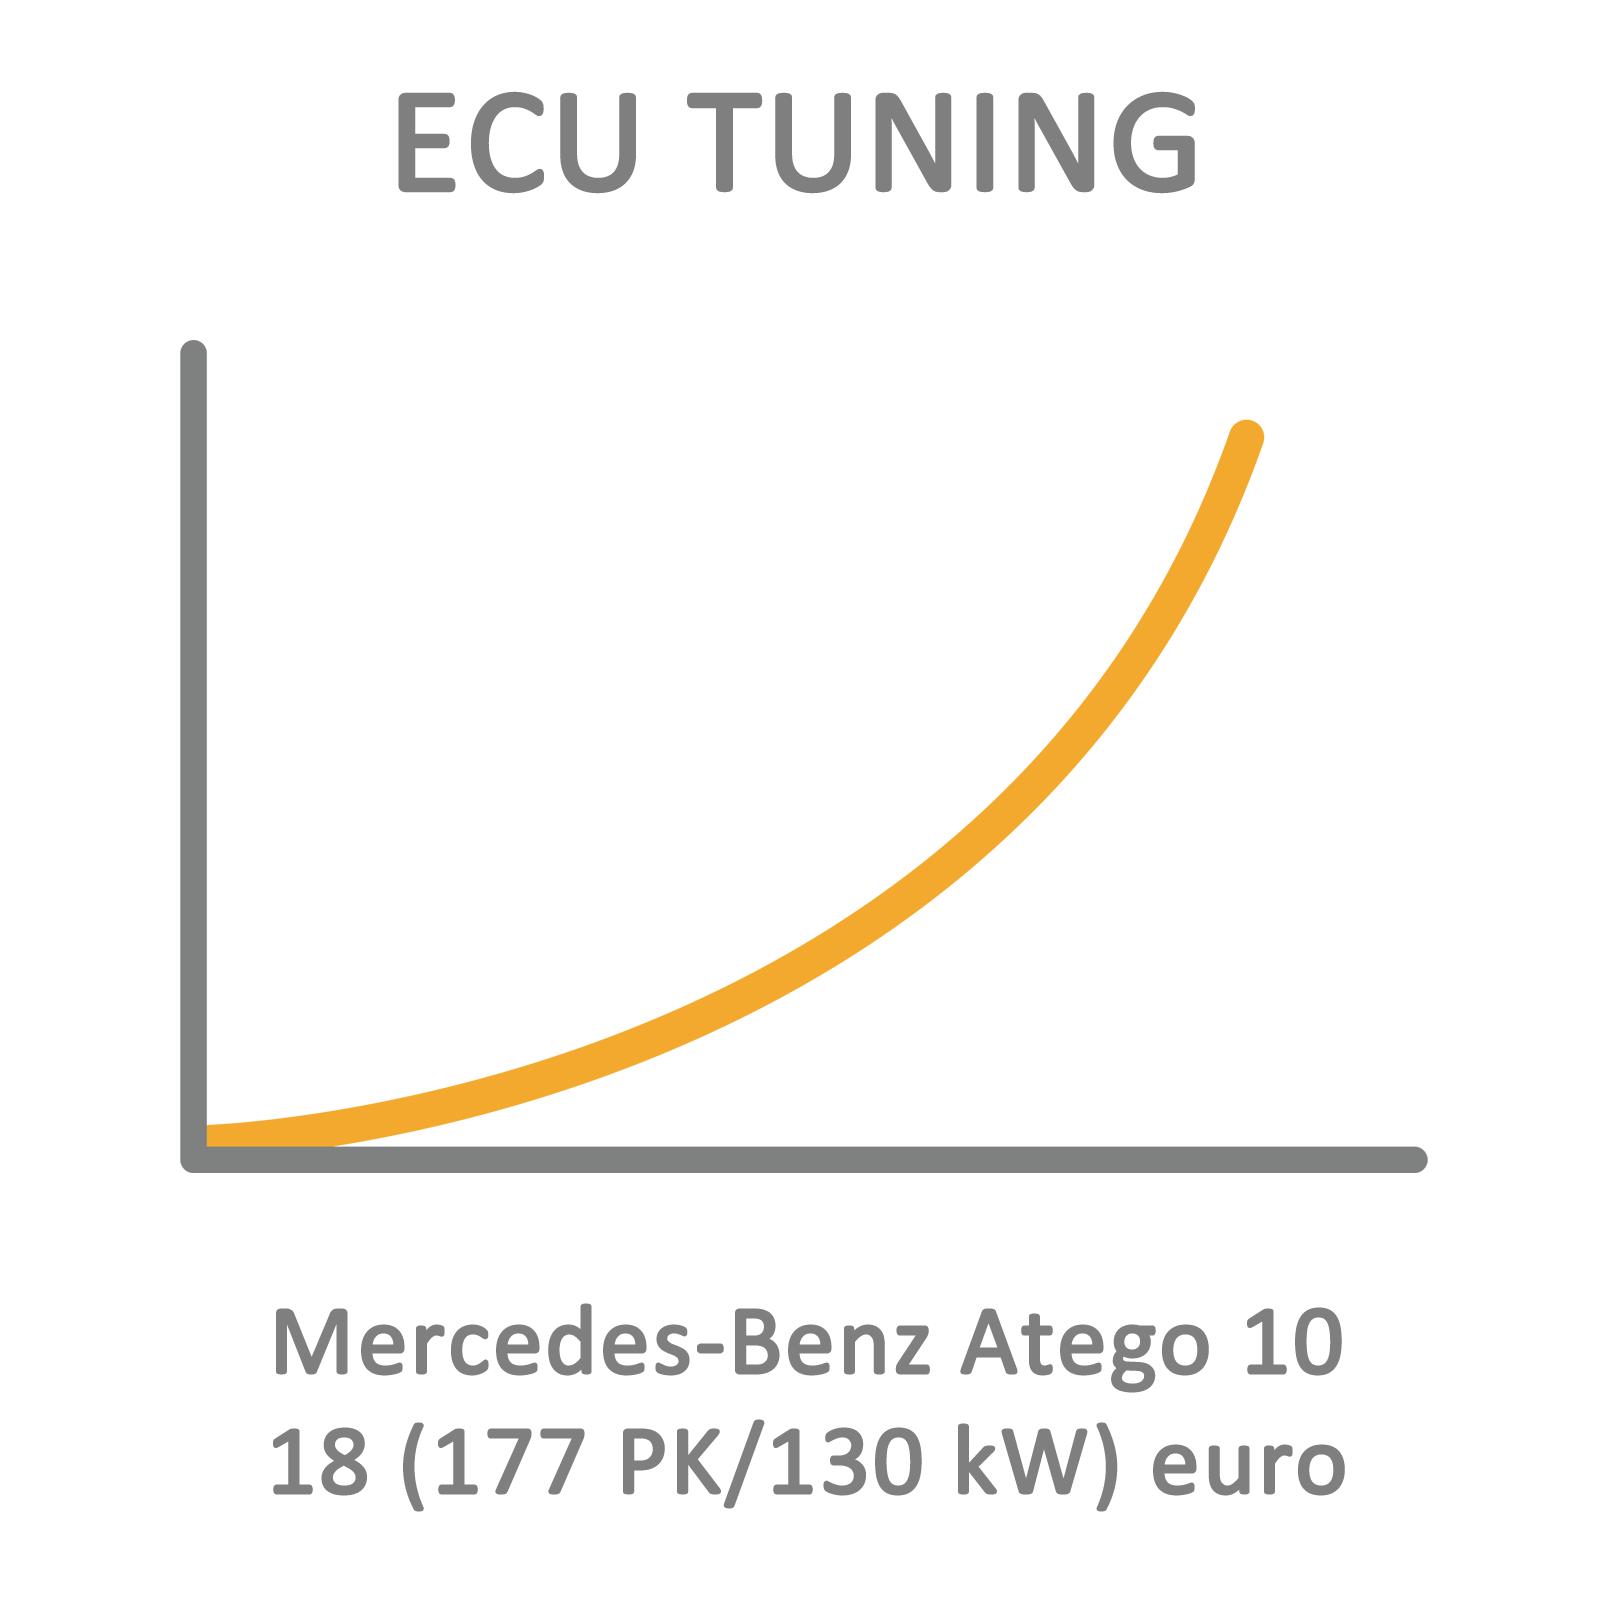 Mercedes-Benz Atego 10 18 (177 PK/130 kW) euro 3+4+5 ECU